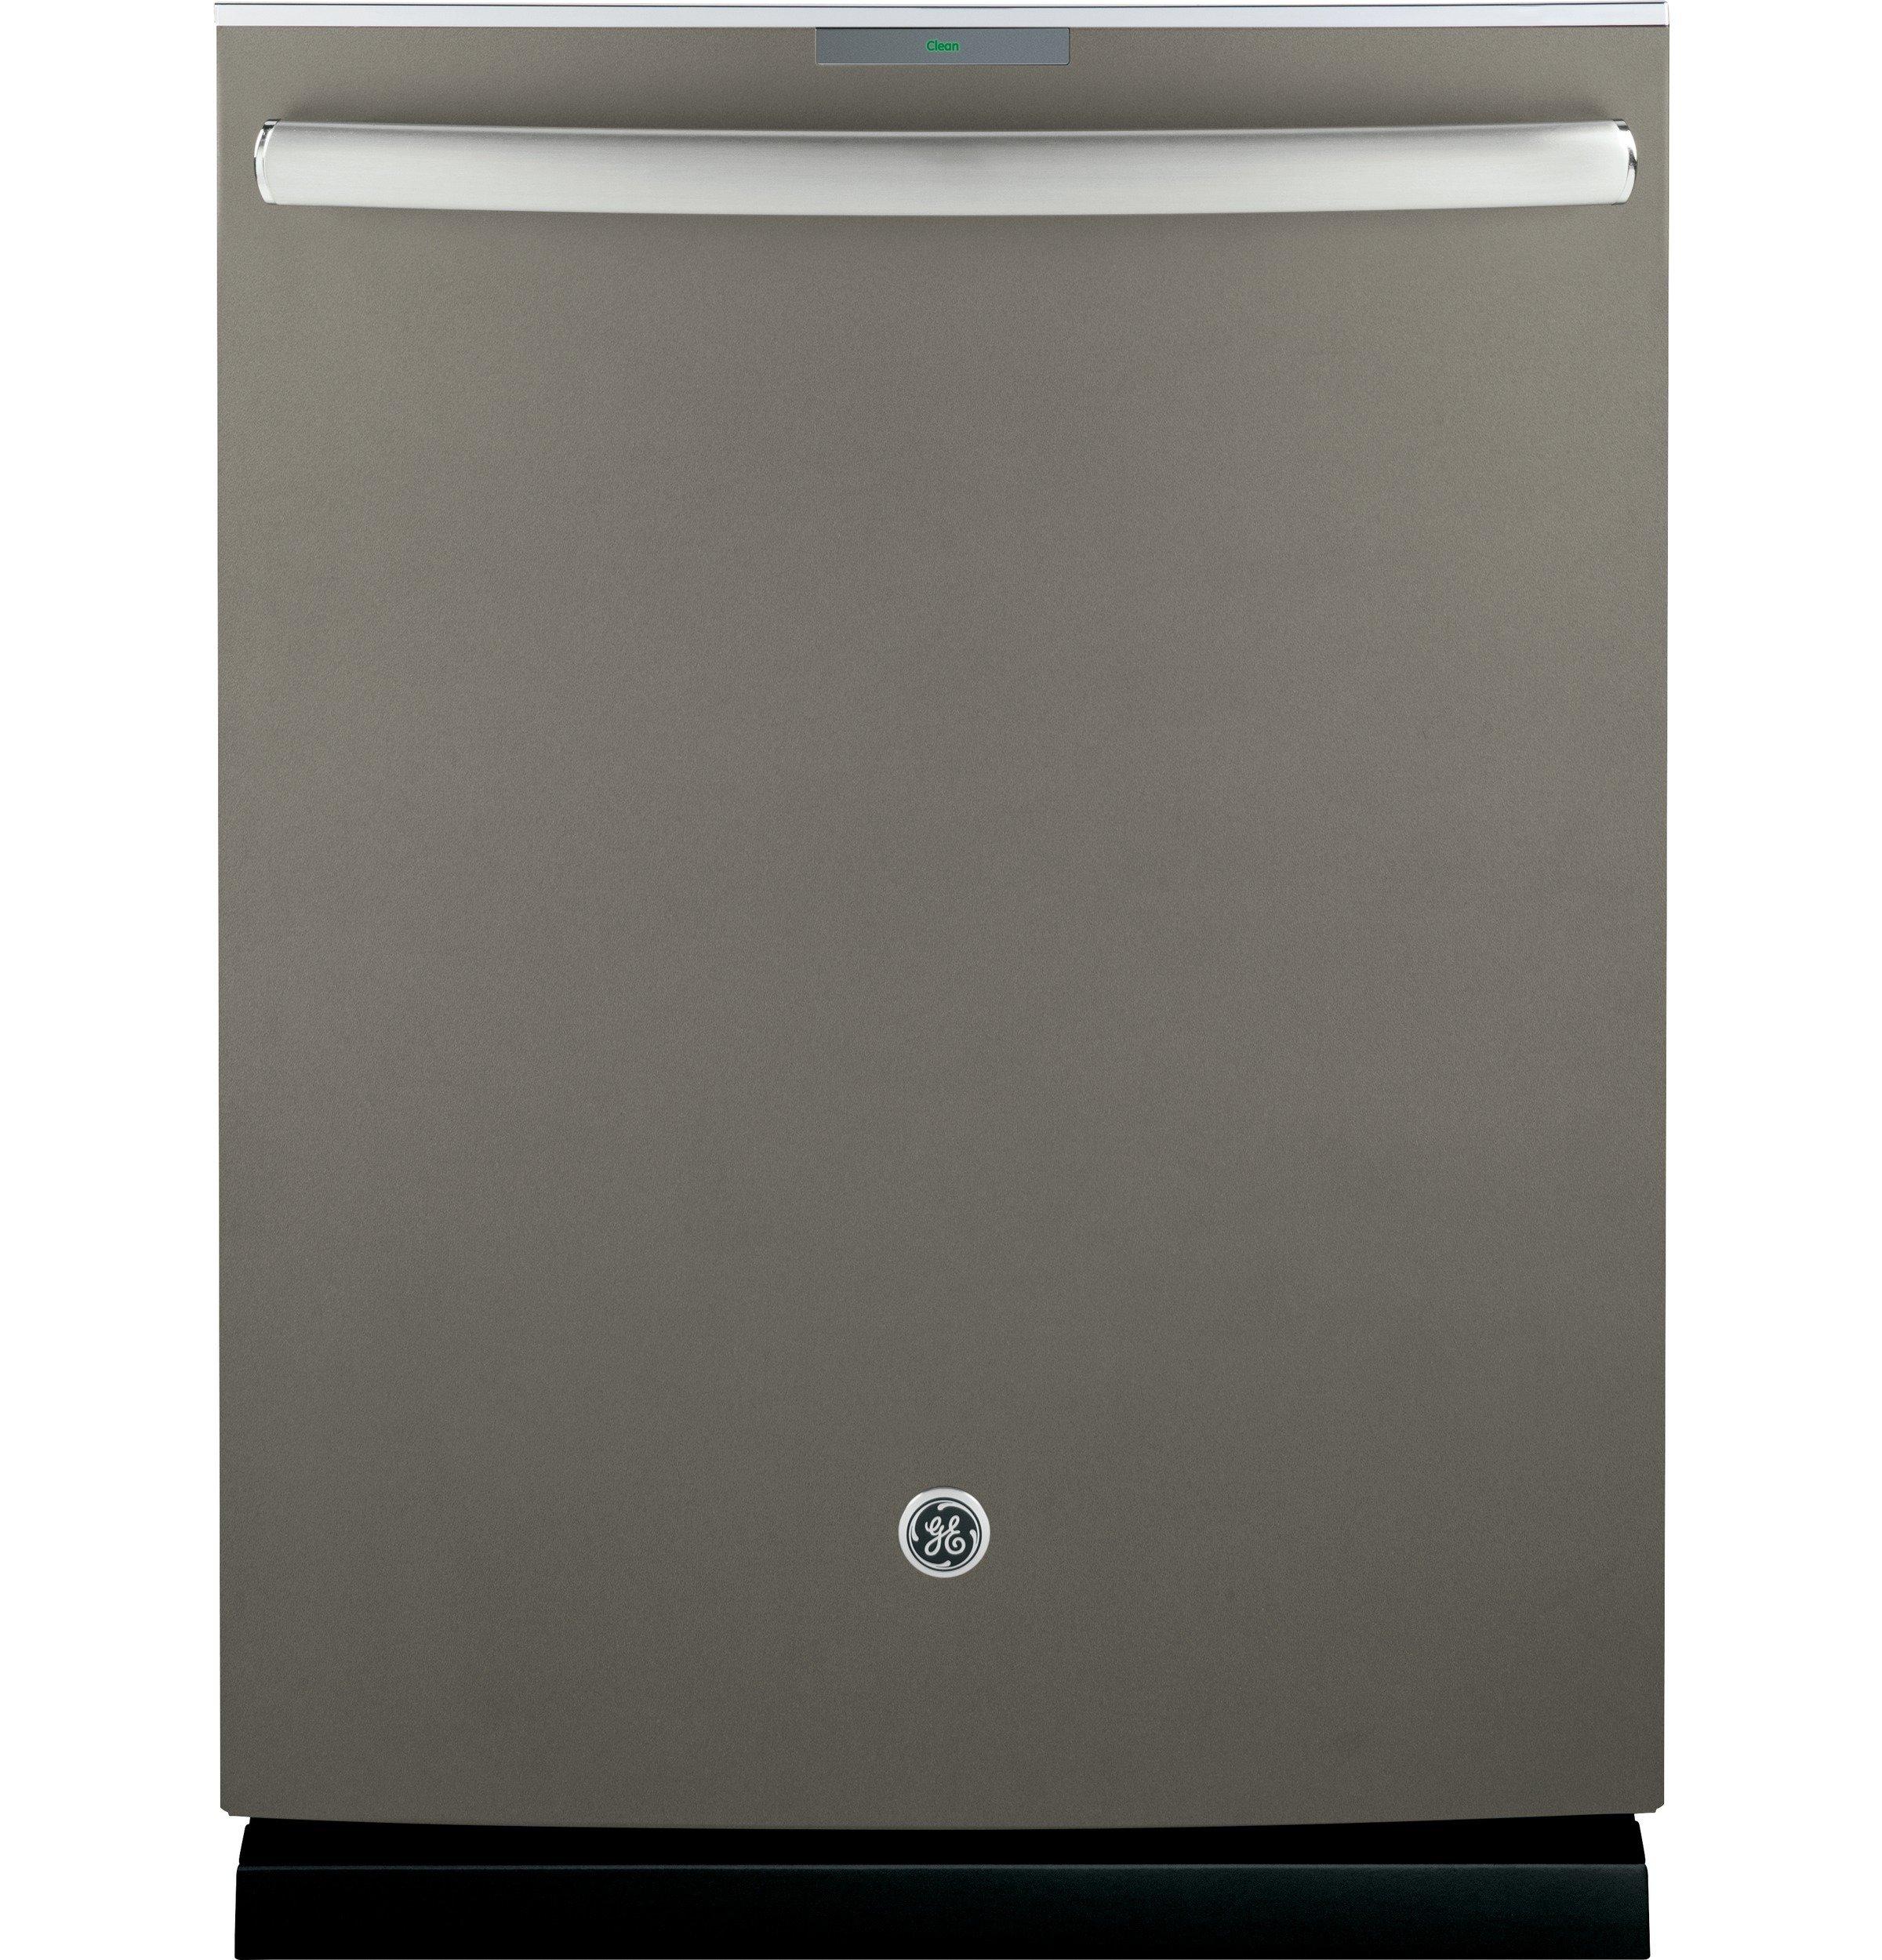 GE Profile Slate Dishwasher BMT0000081169